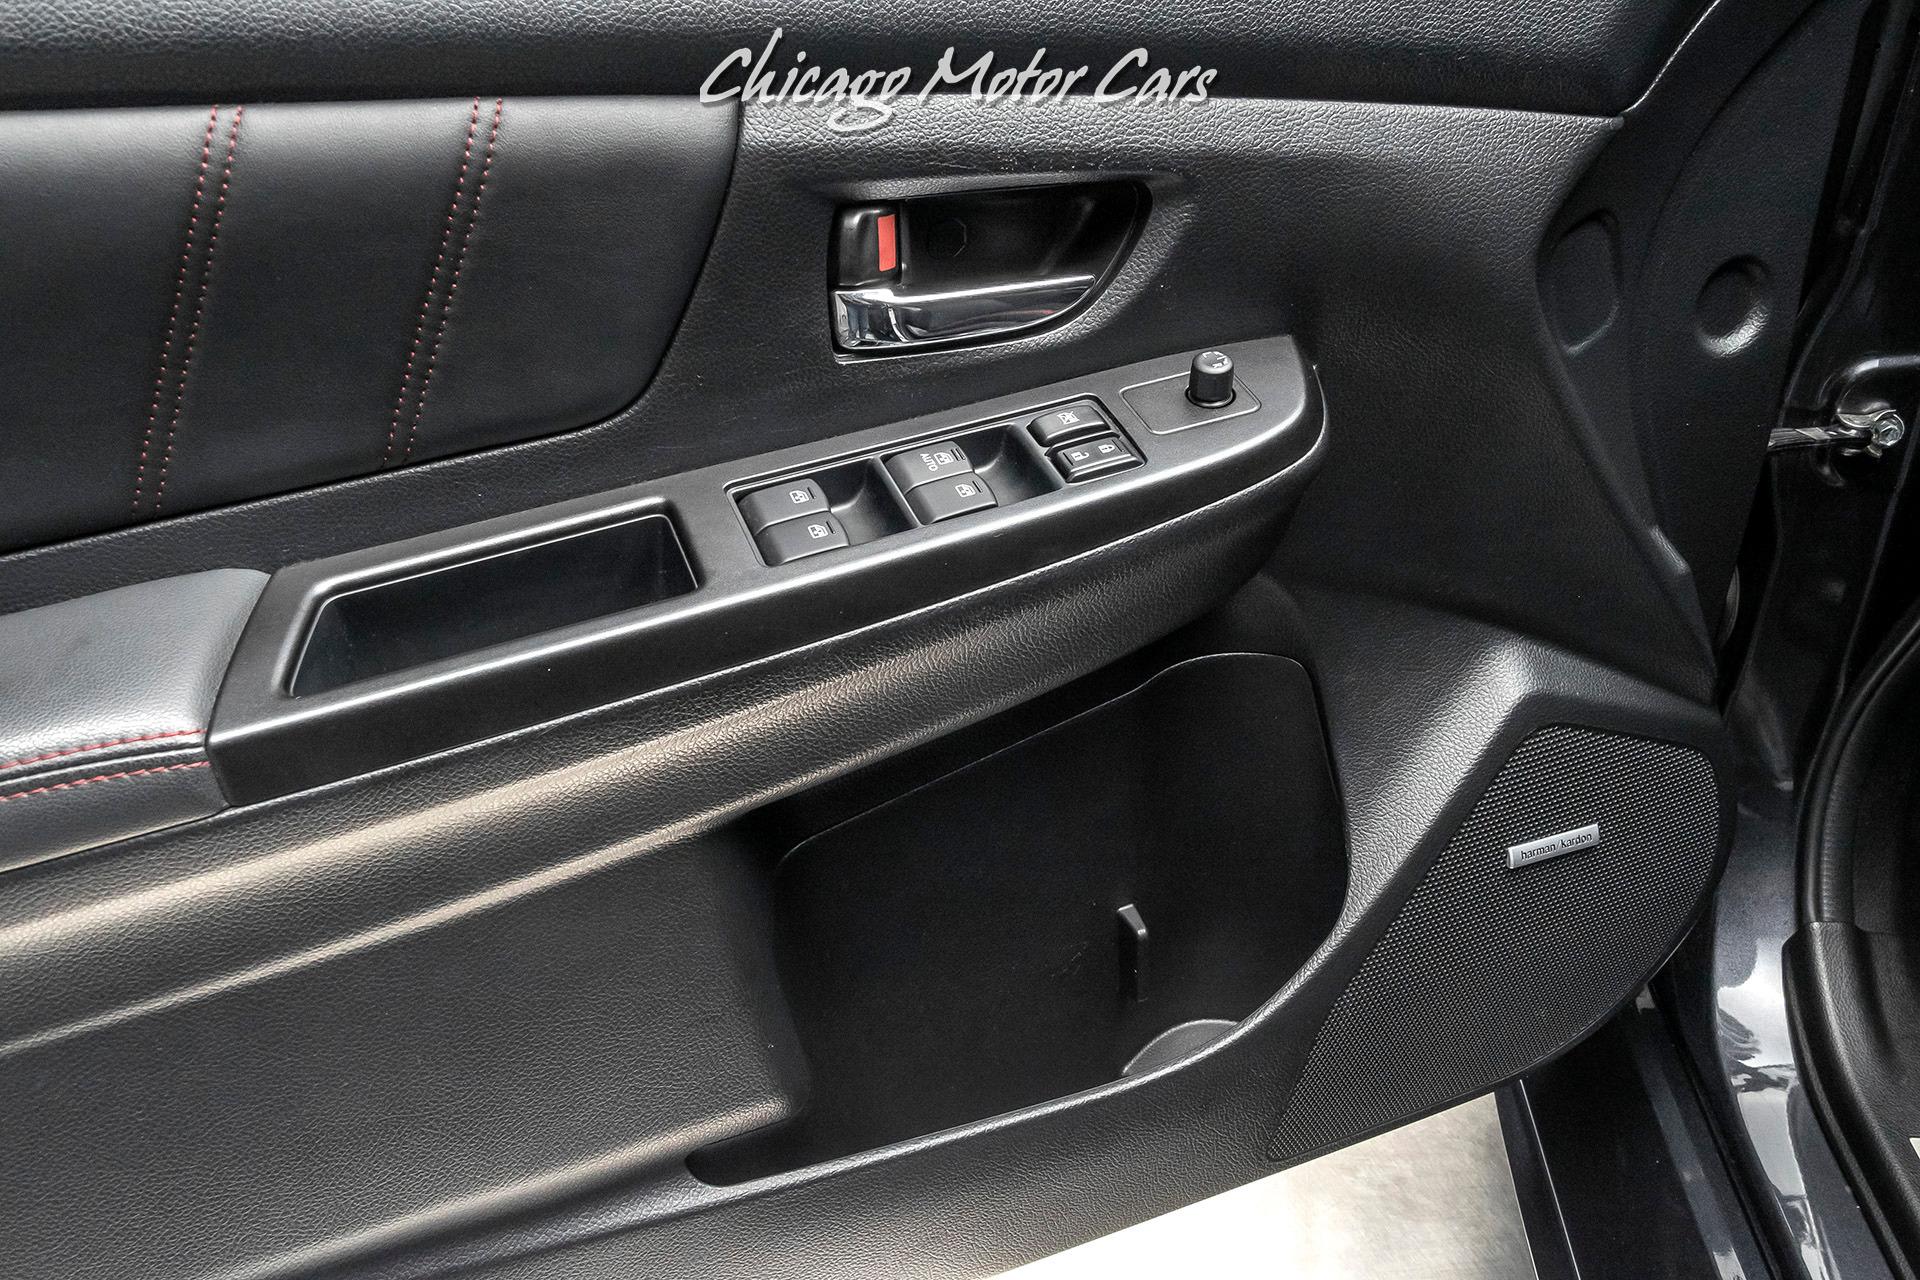 Used-2015-Subaru-WRX-STI-Limited-Sedan-ONLY-38K-Miles--FUN-6-SPEED-MANUAL